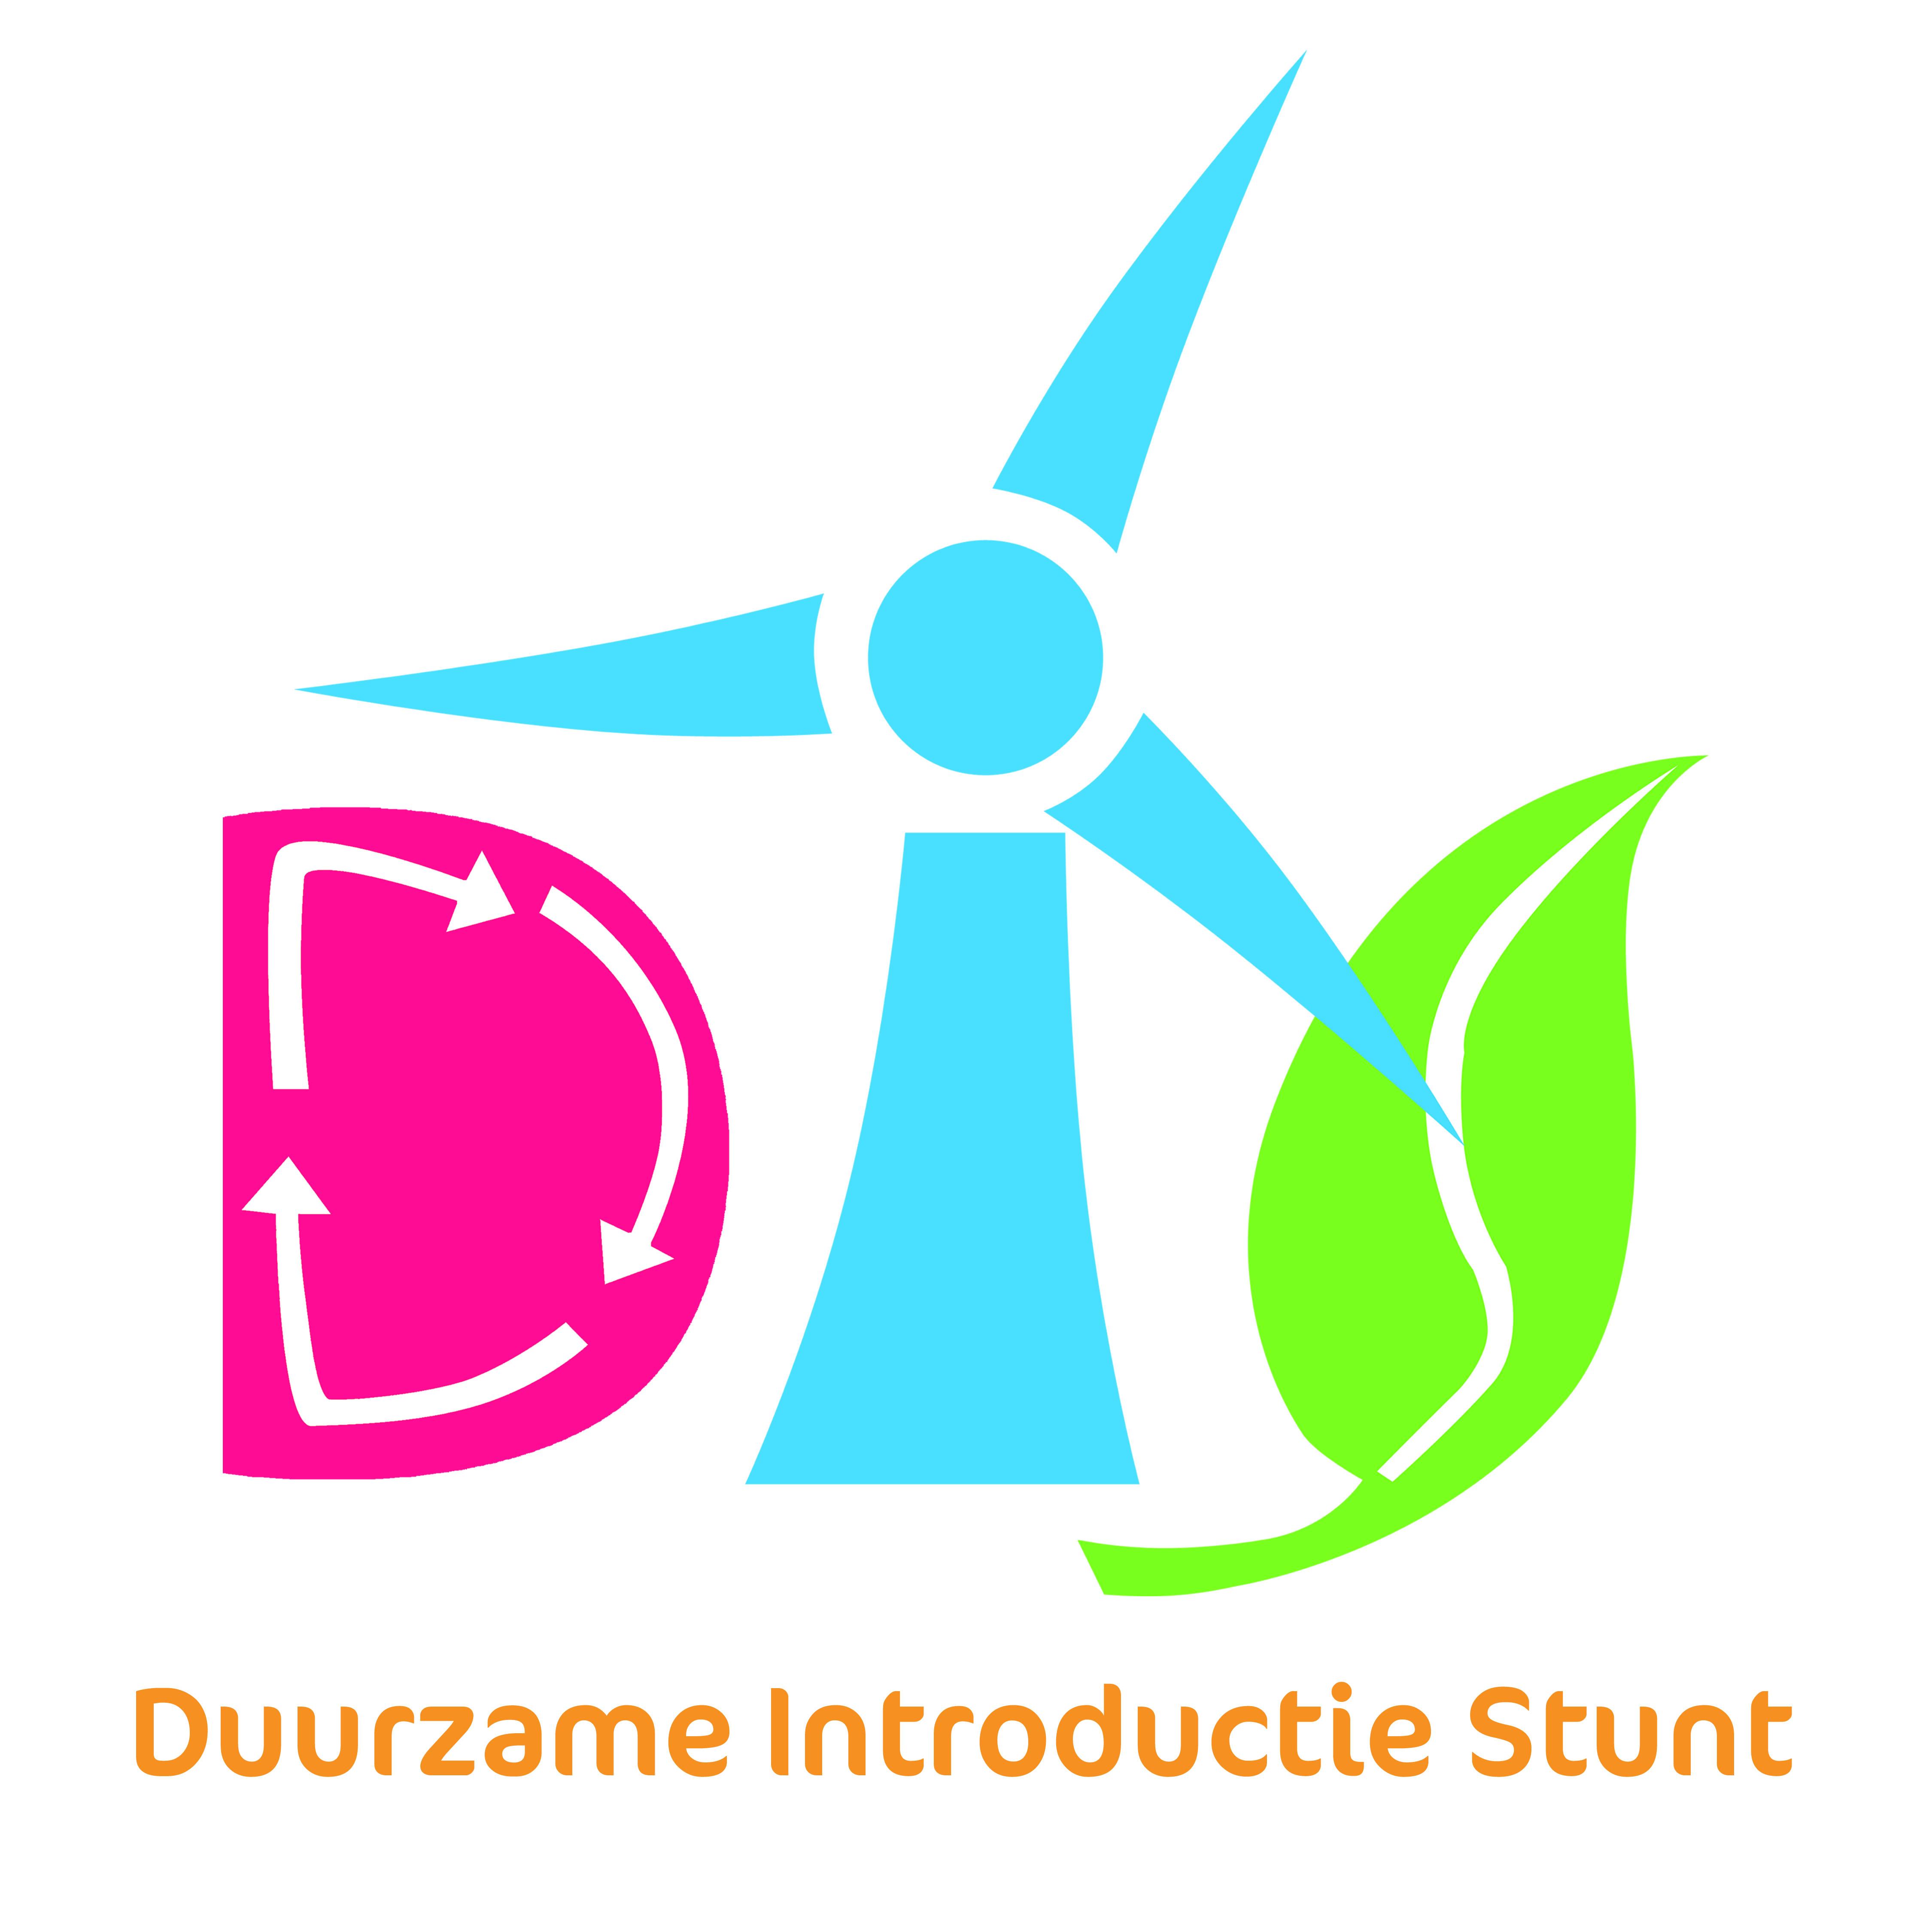 Organiseer Duurzaamste Intro En Win Duizend Piek!